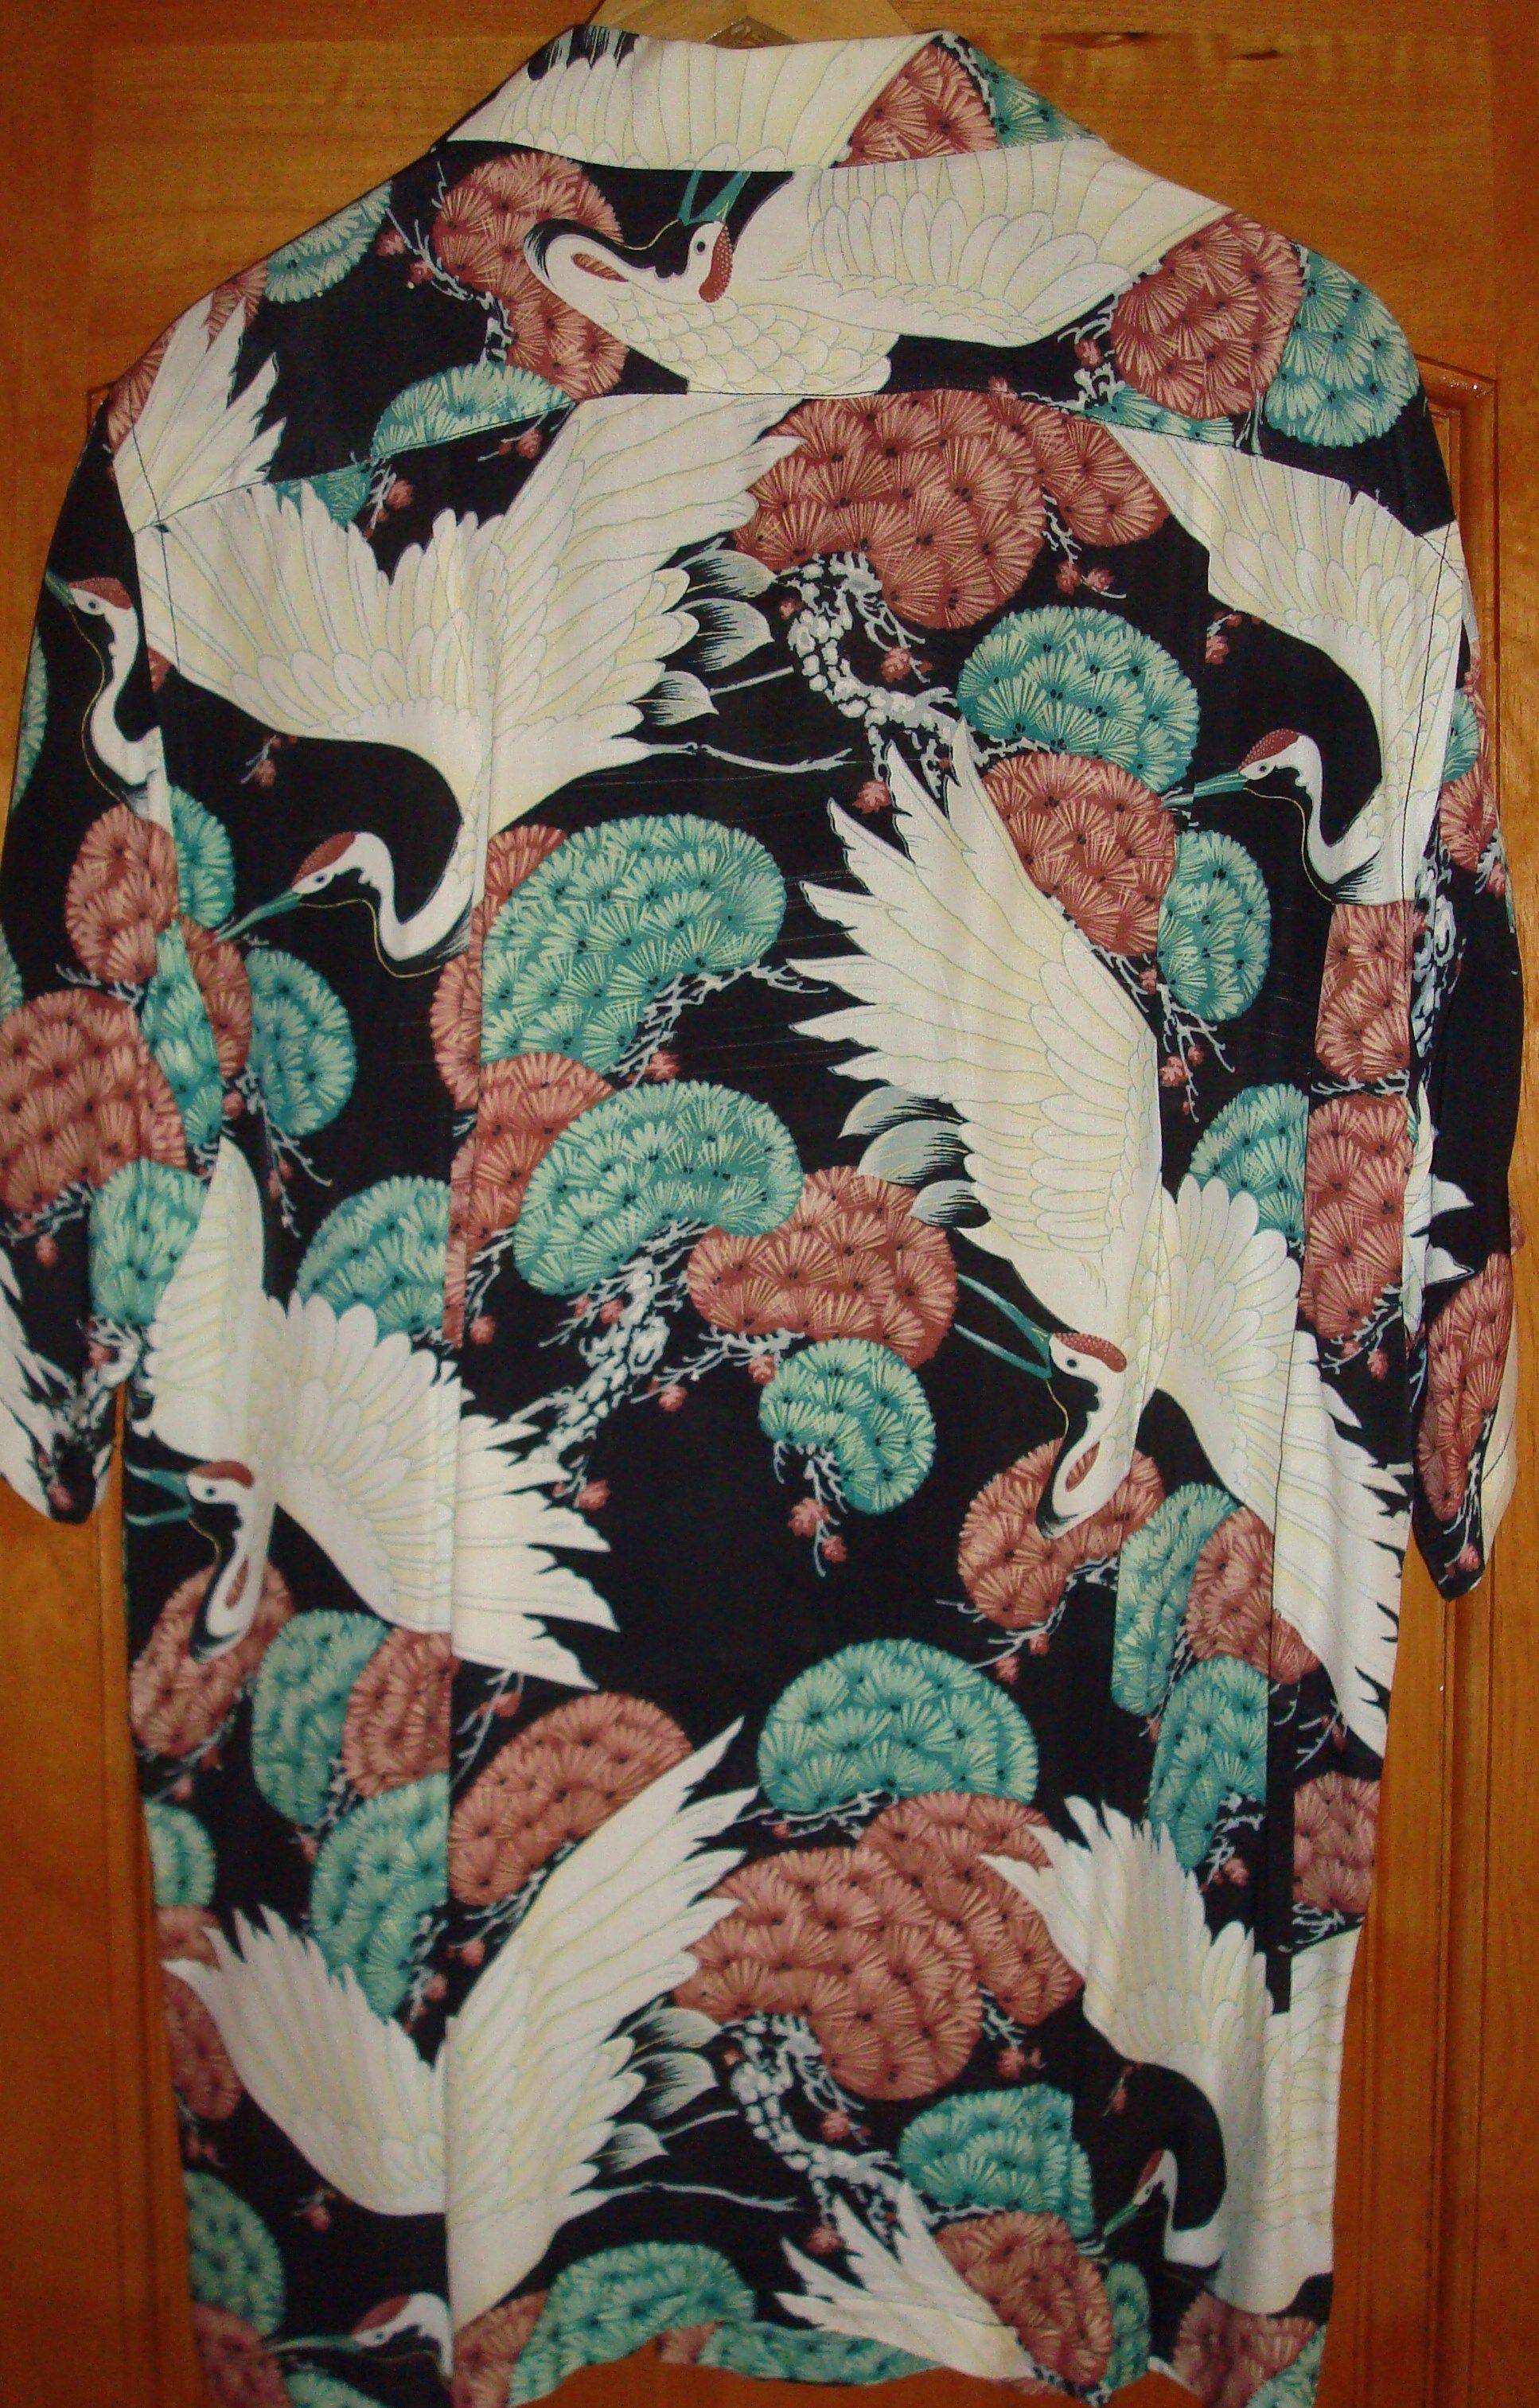 c4e7d9846 Andrade - Vintage 40s Rayon Swan Crane Hawaiian Aloha Shirt -  TheHanaShirtCo #bowlingshirts